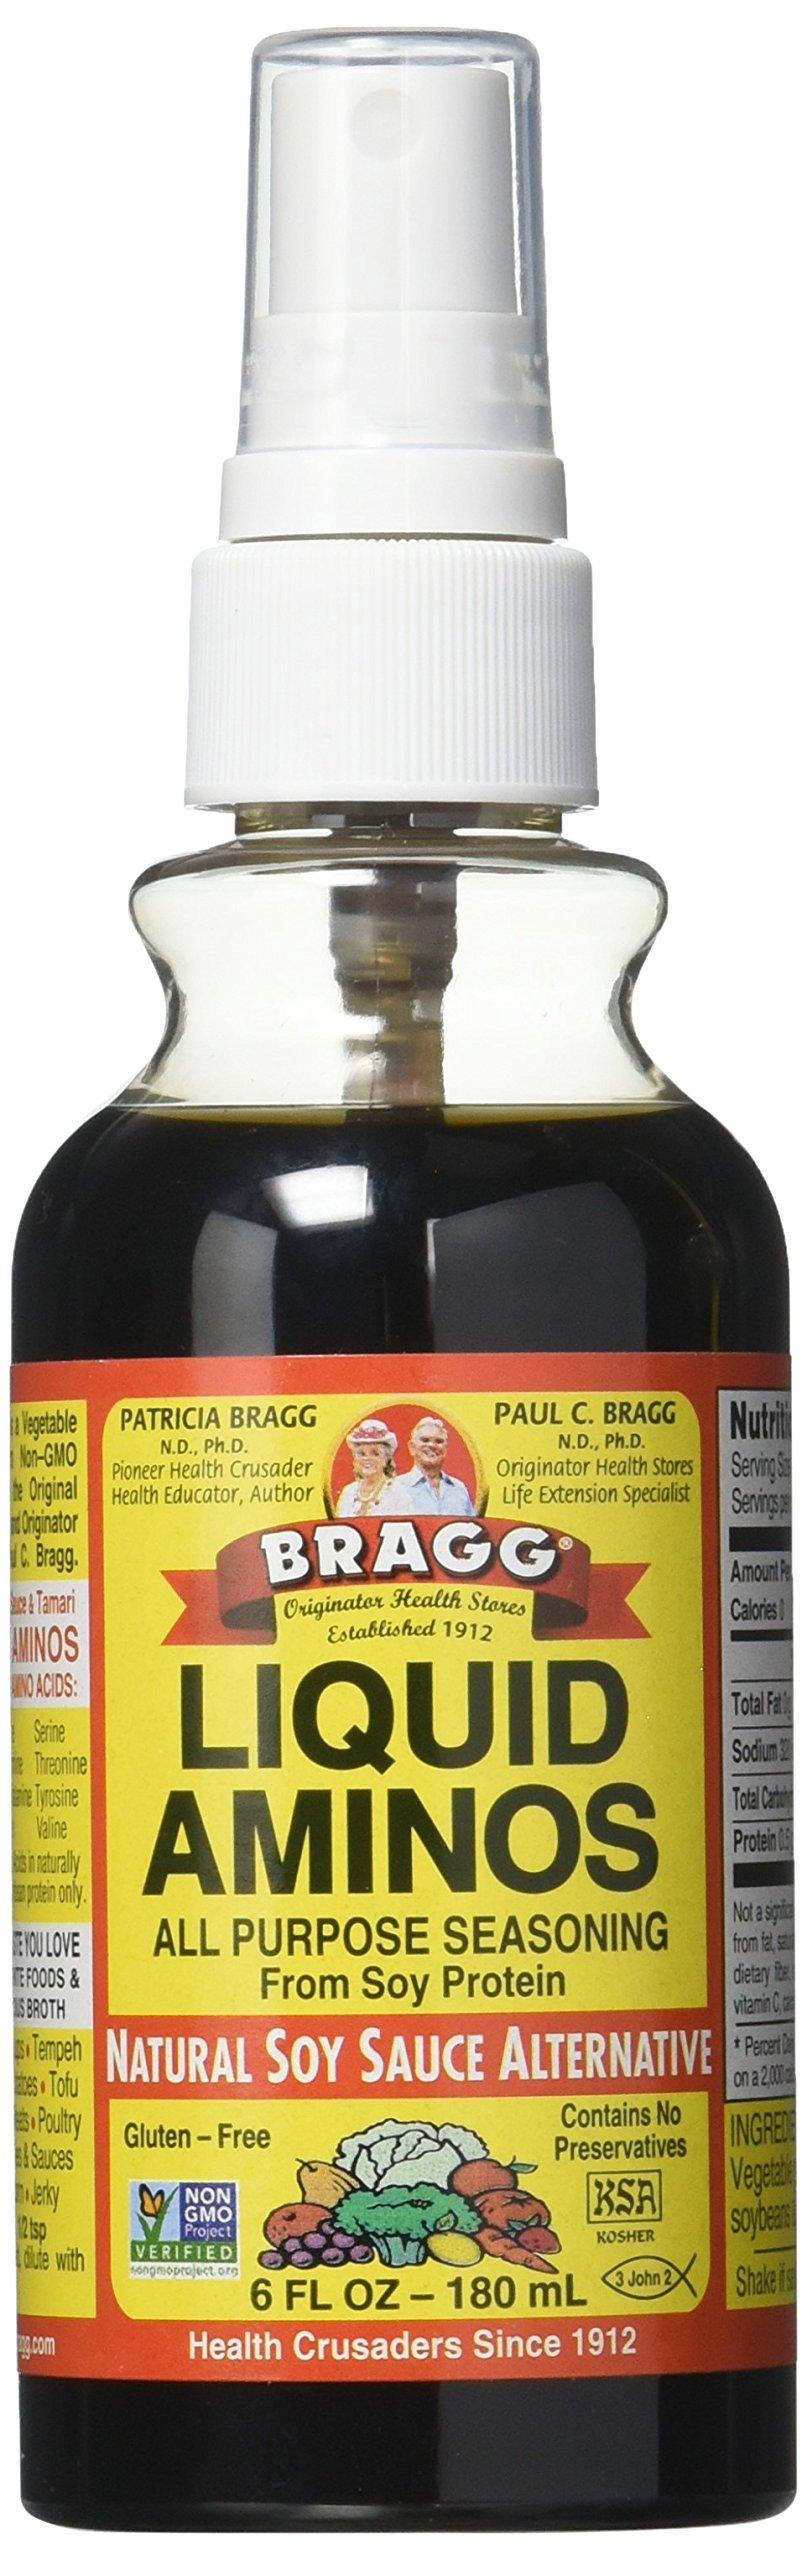 Bragg Liquid Aminos, 6 fl oz, 4 Pack by Bragg